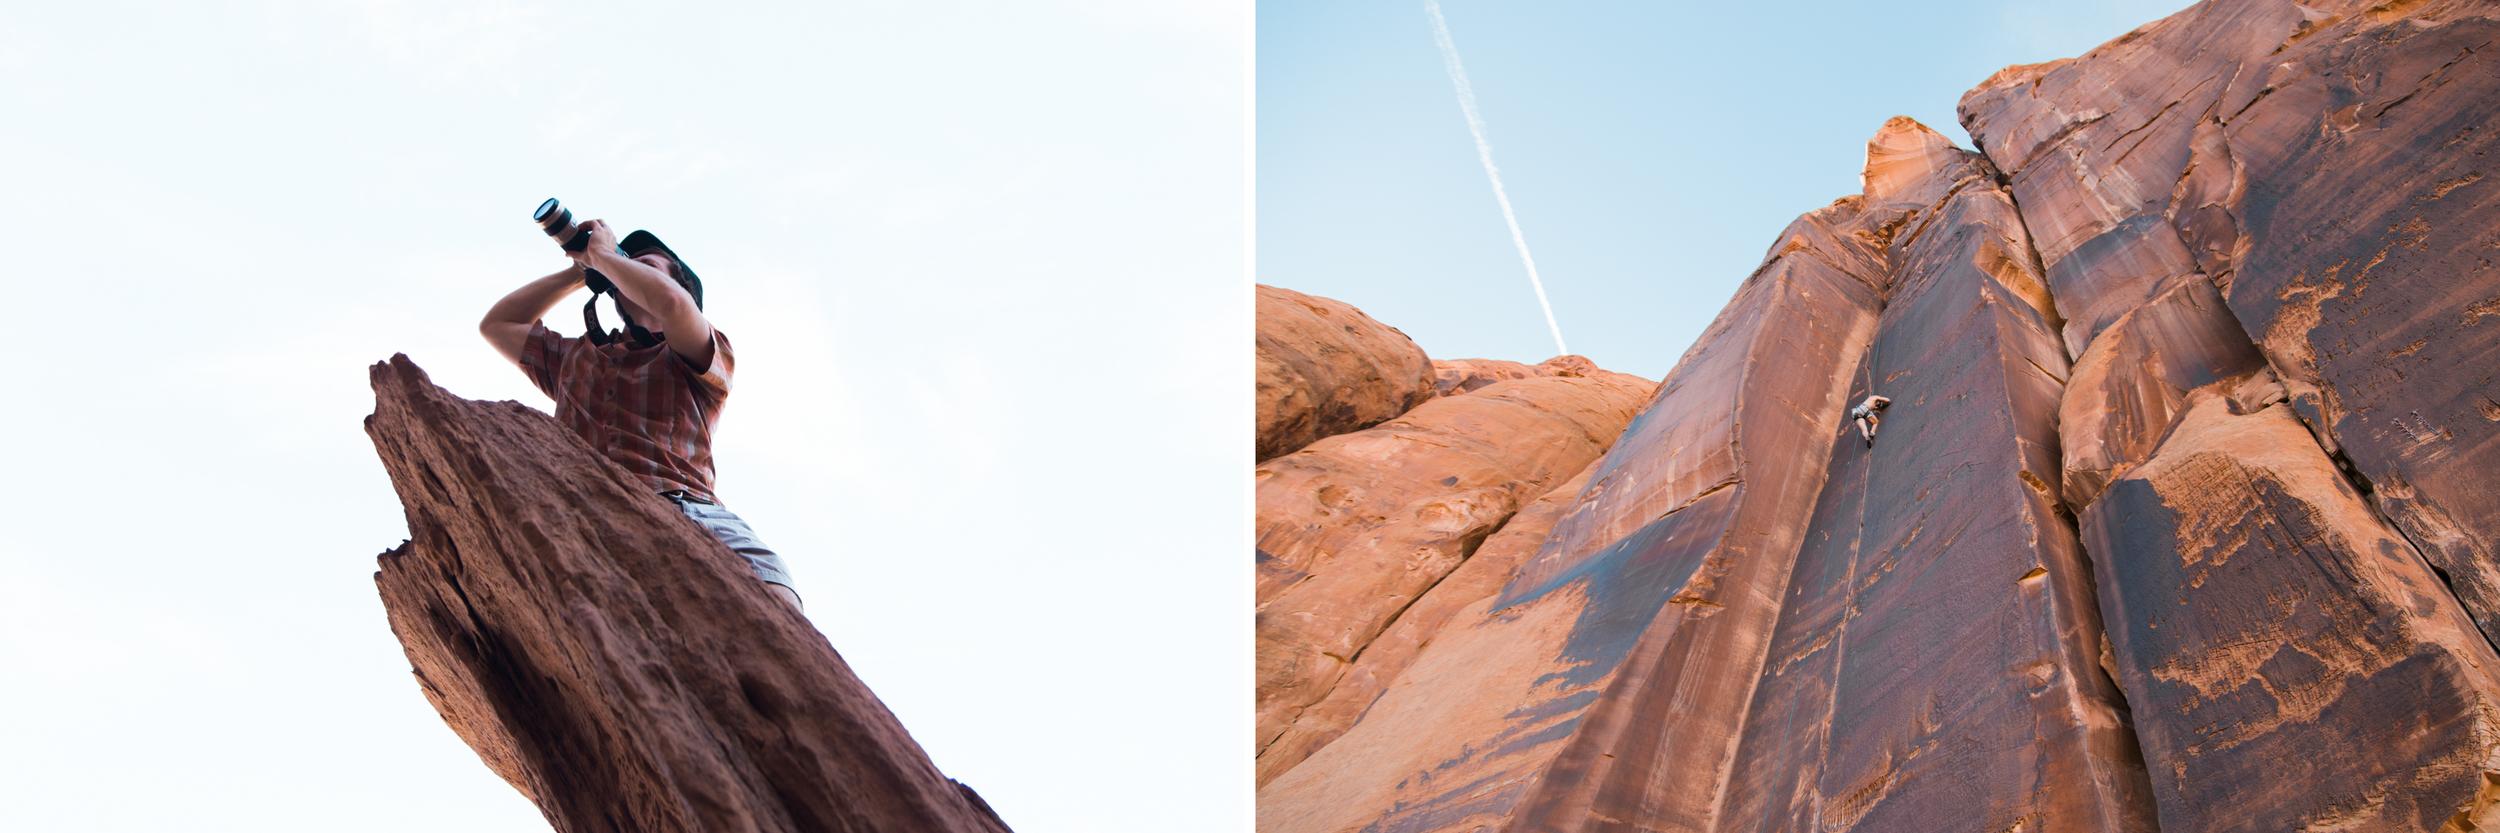 southern utah colorado arches national park moab denver estes park rocky mountain denver boulder wedding portrait adventure photographer photography